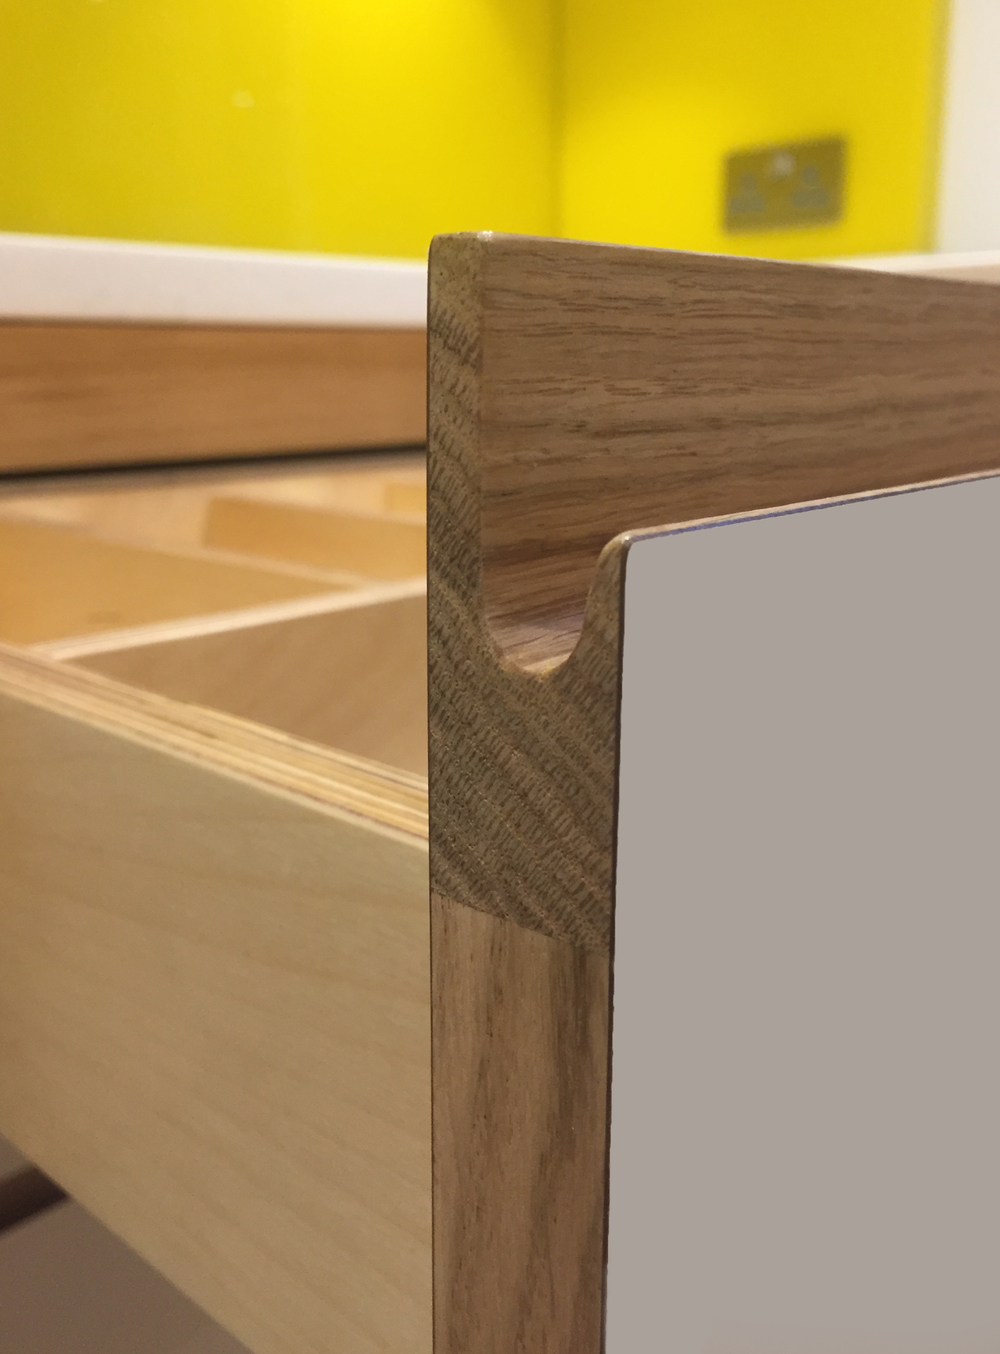 Square-One-Design-kitchen-oak-Antartica-corian-Formica-glass-yellow-6.jpg